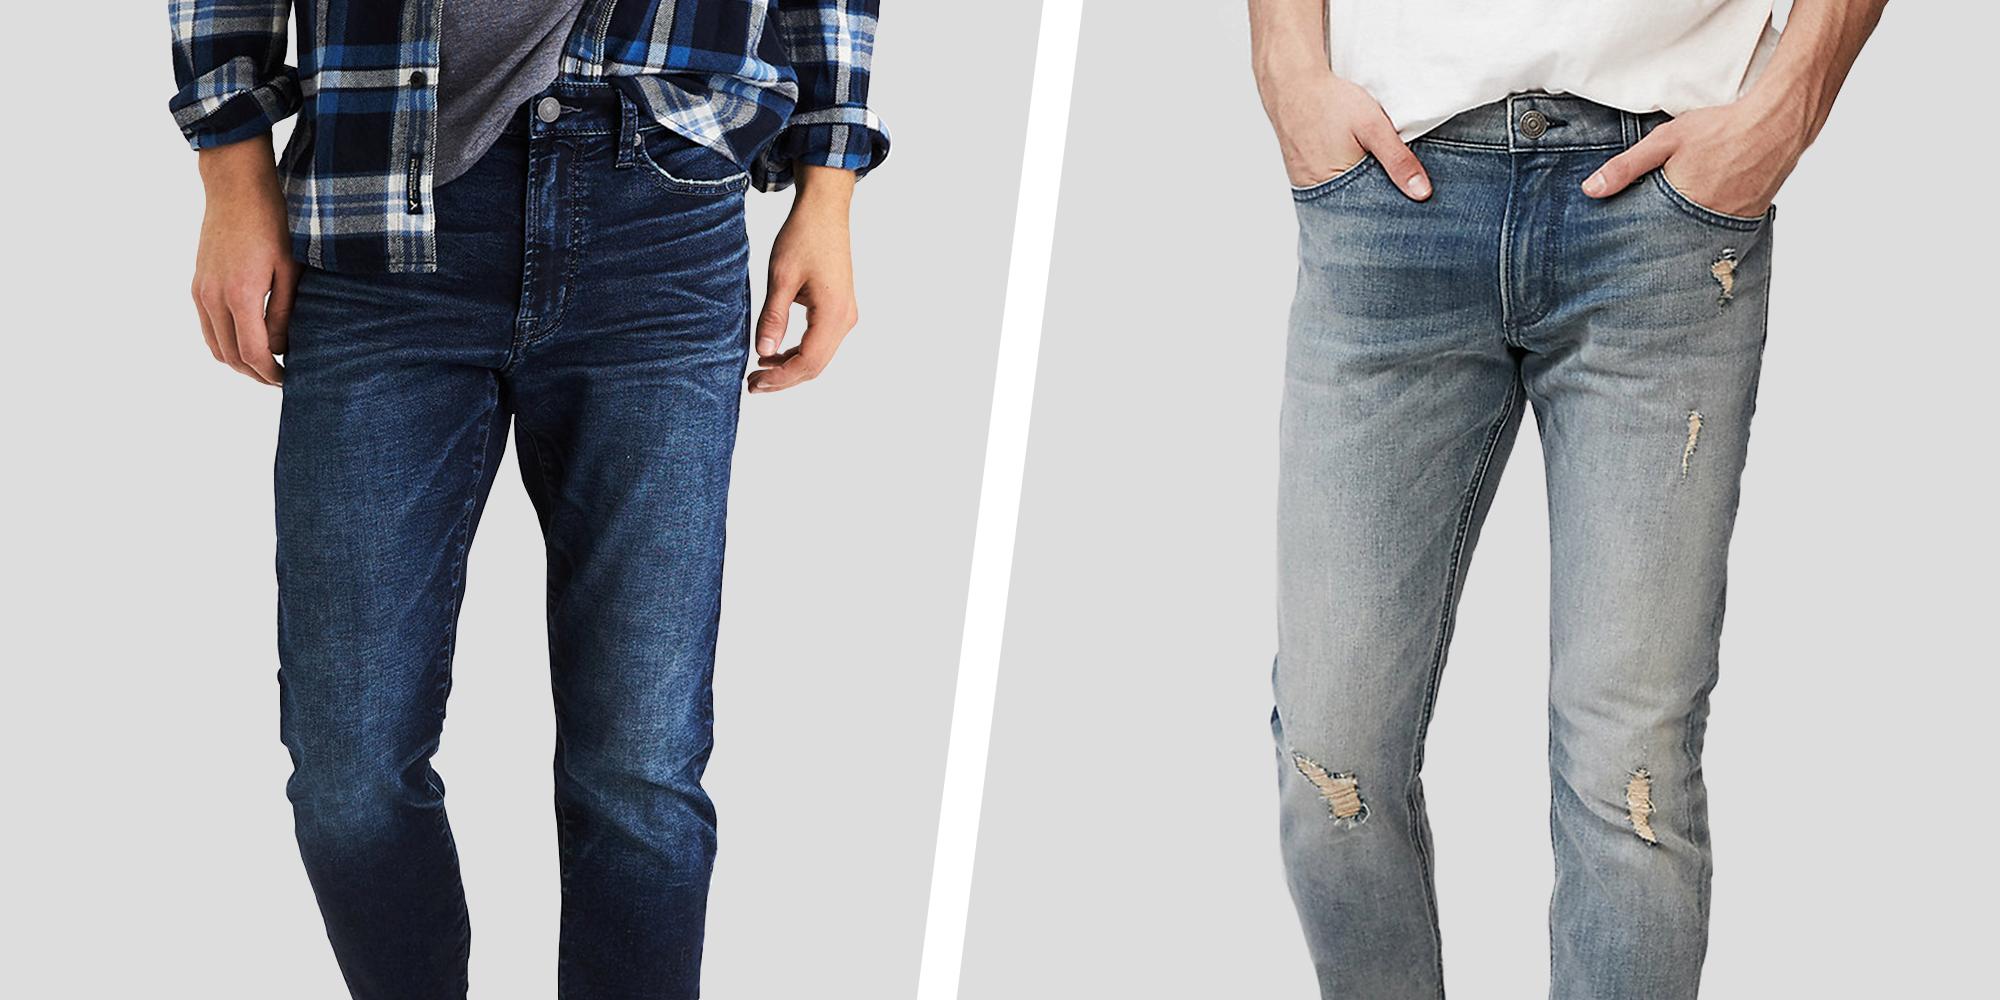 pants men denim fashion jeans selvedge winter most for fall top comforter comfortable dark slim best mens levis indigo